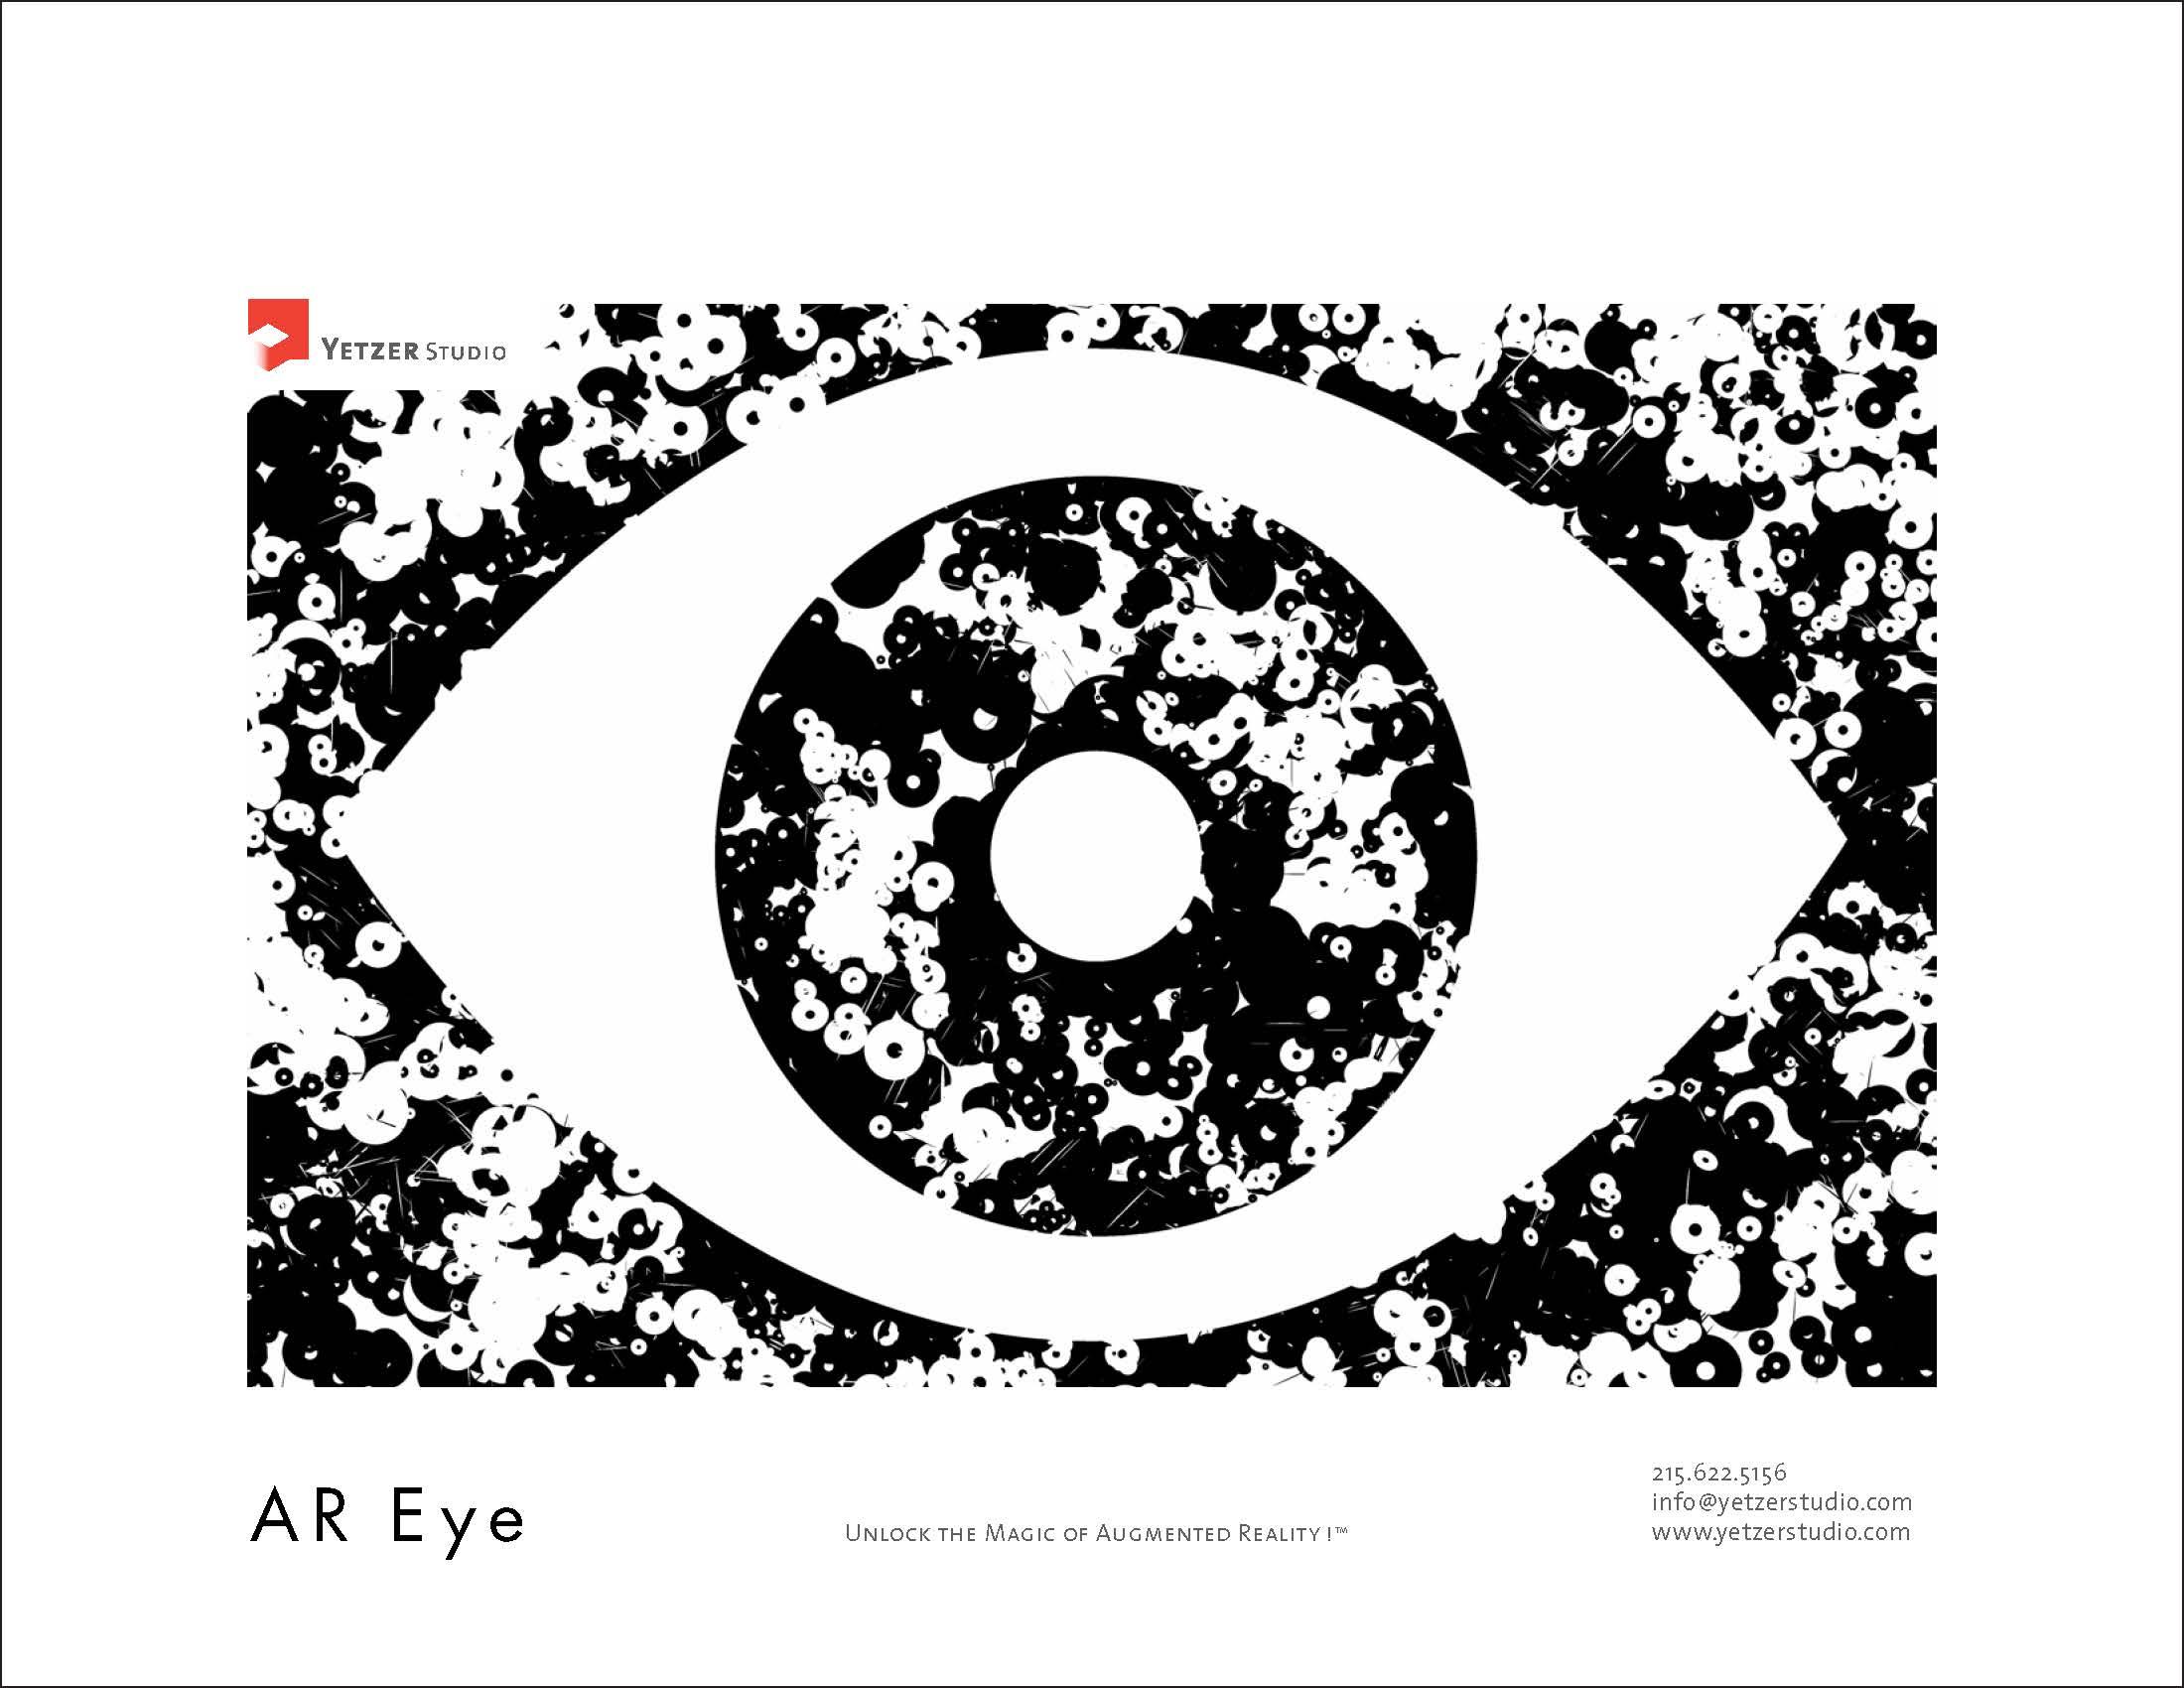 The Augmented Reality Eye